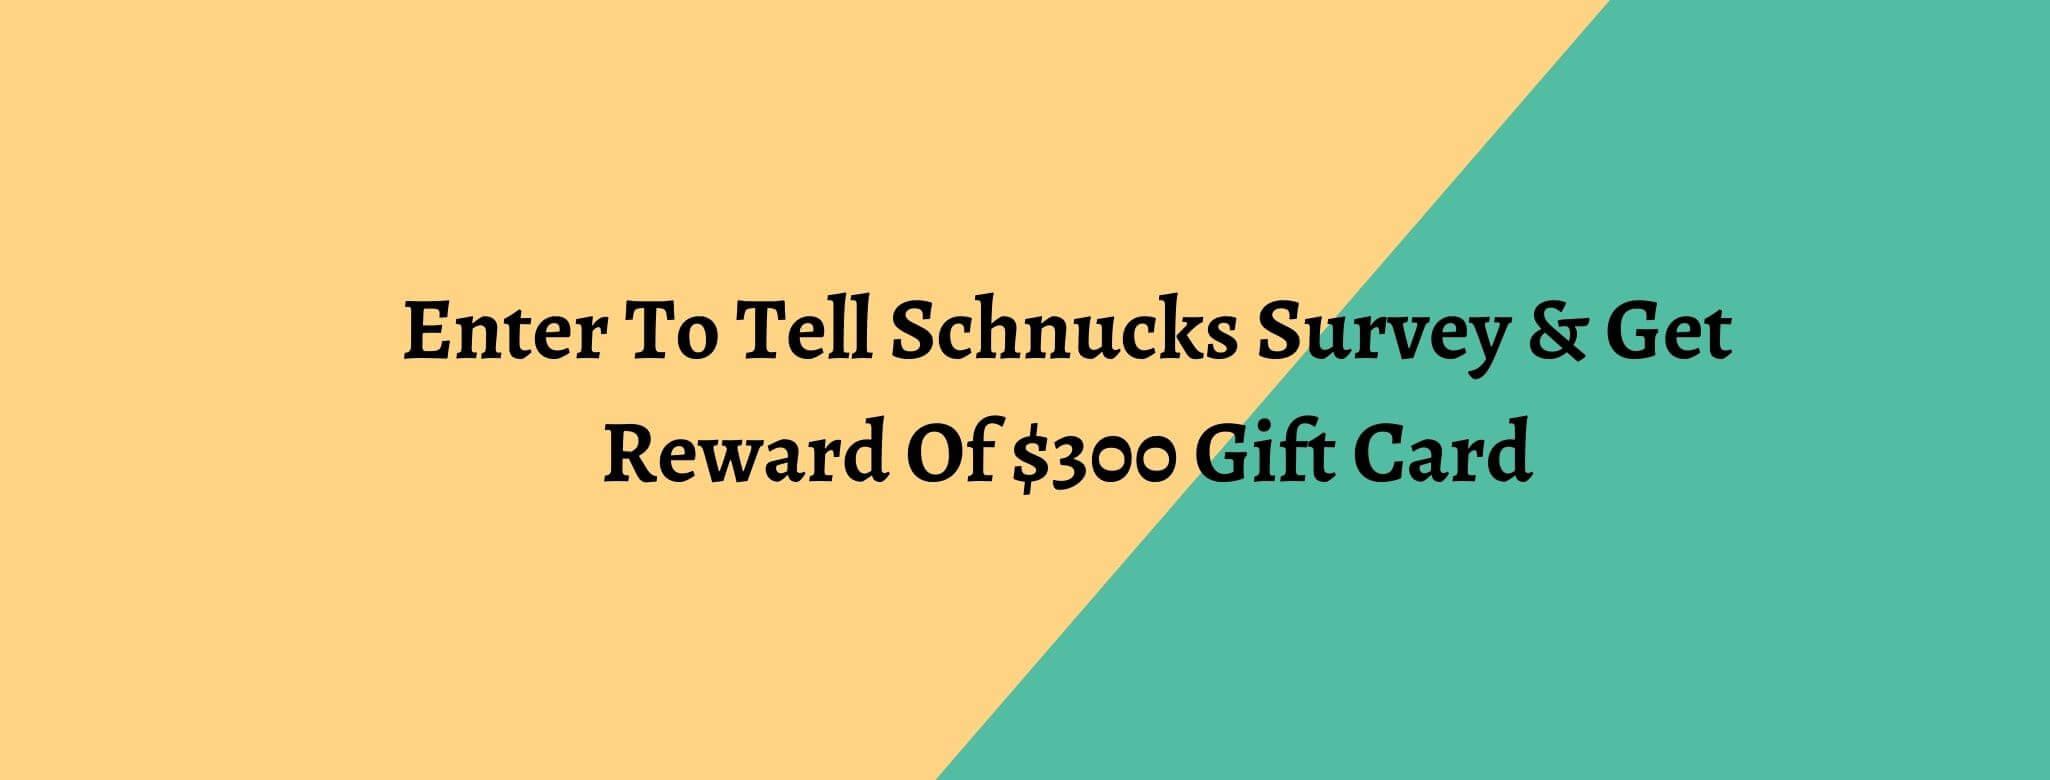 tell schnucks